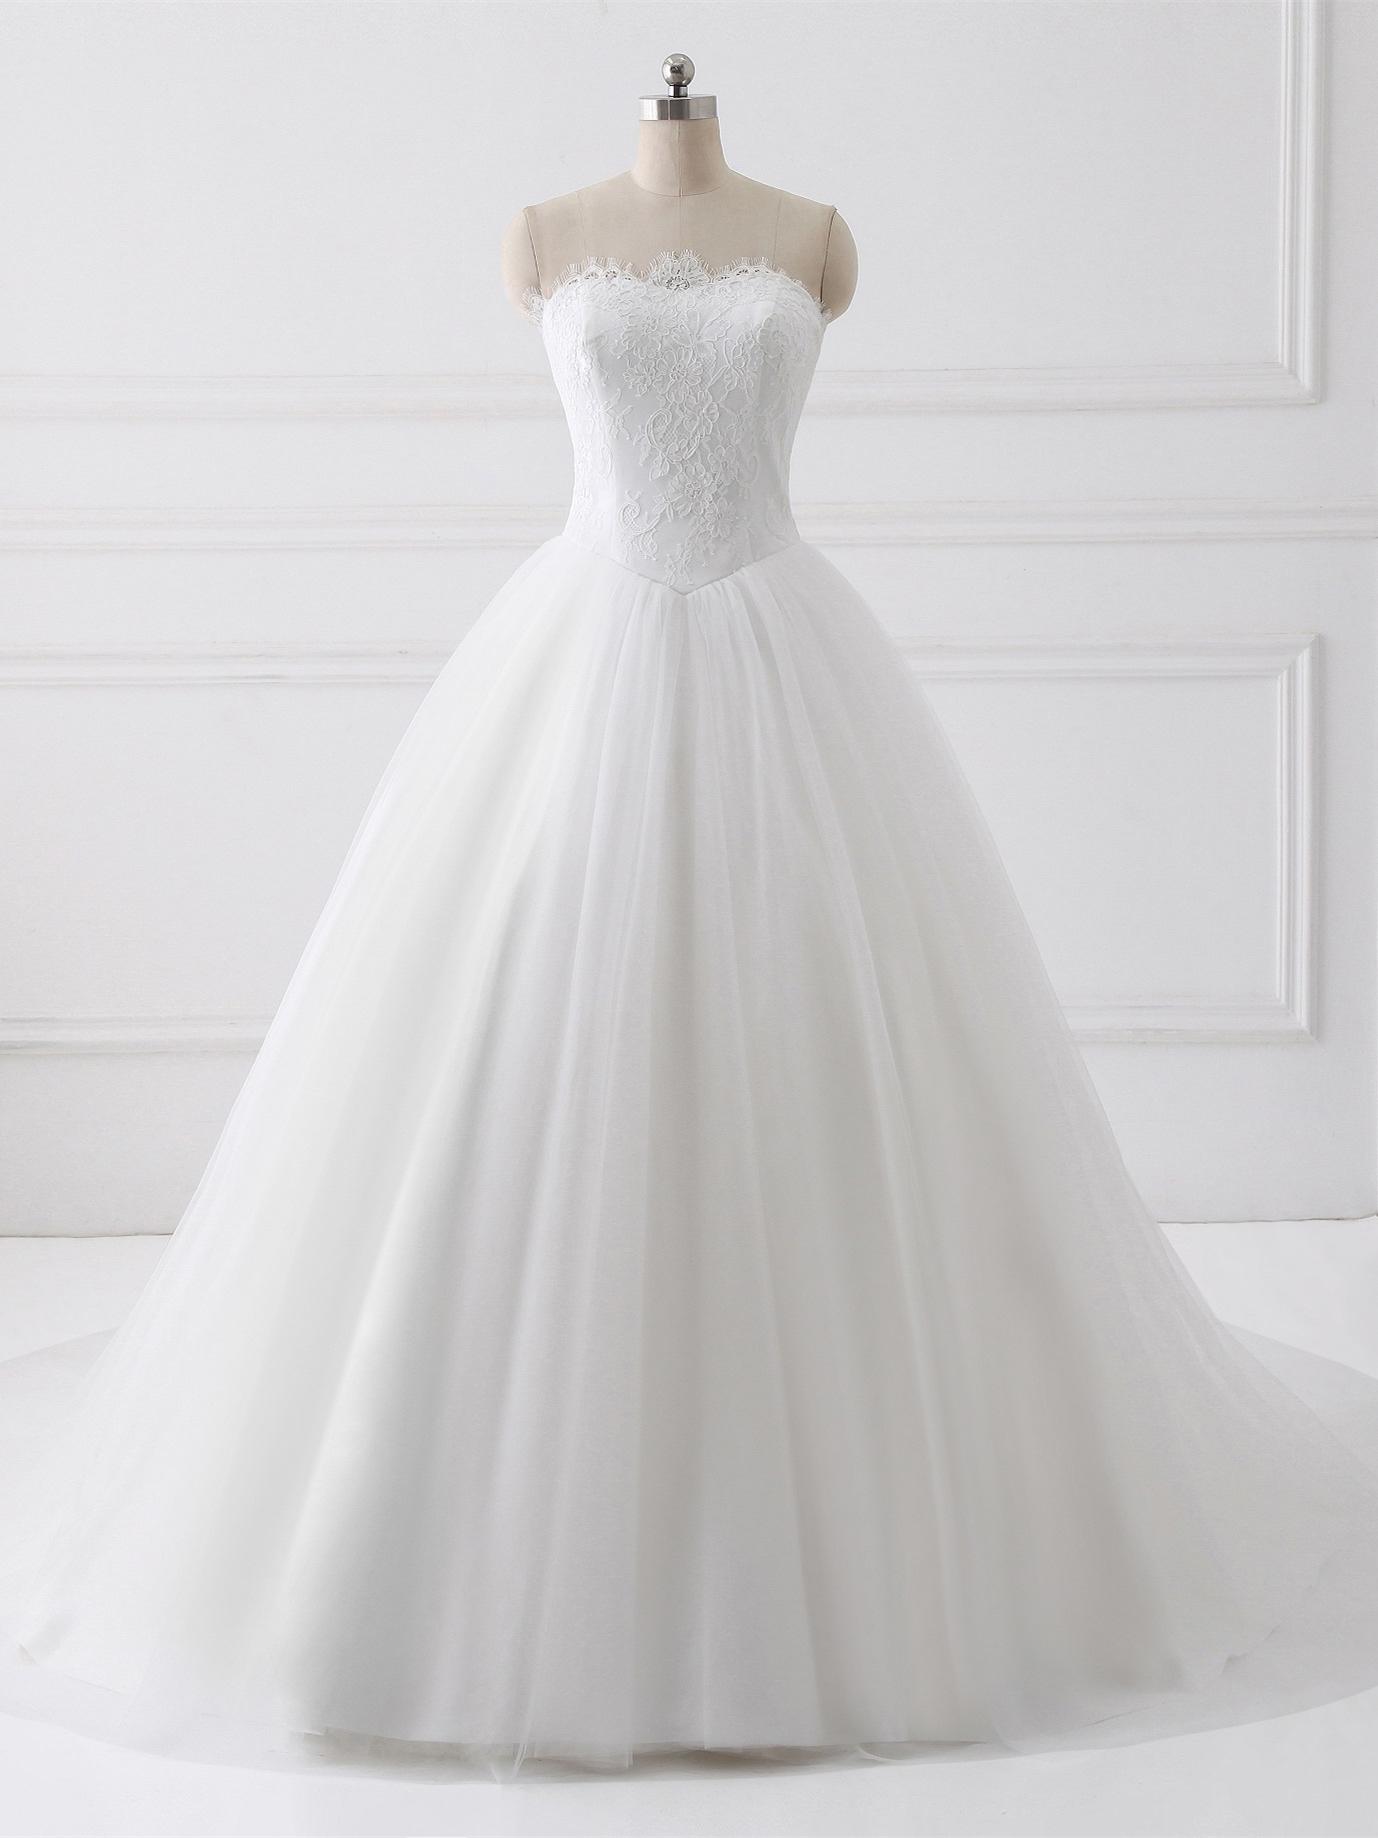 Princess Wedding Dresses Sweetheart Neckline